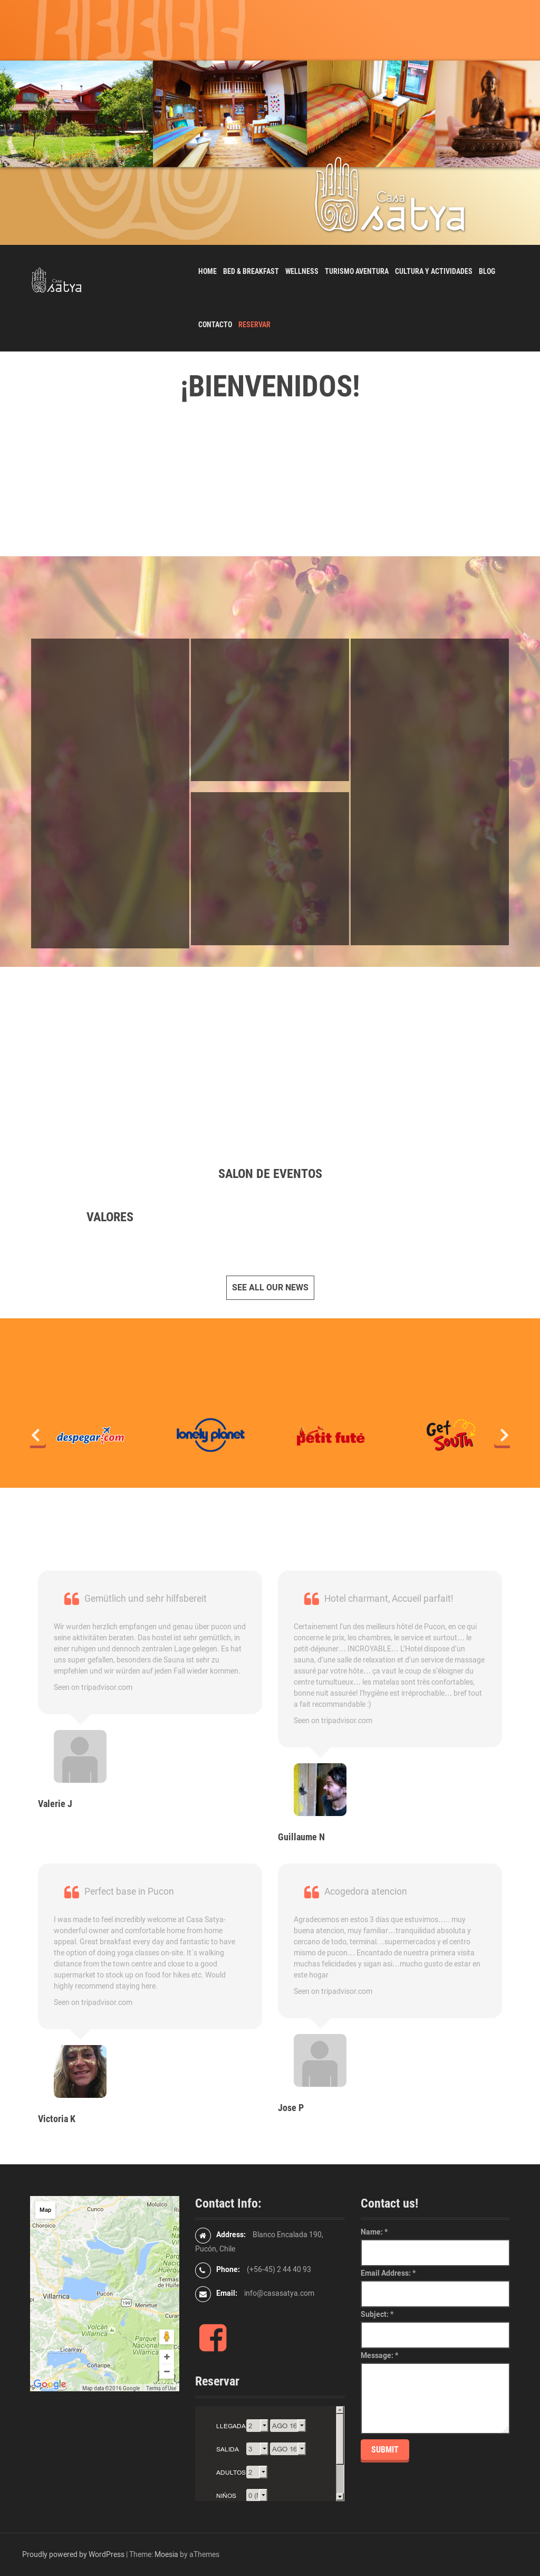 Prix D Un Sauna casa satya pucon competitors, revenue and employees - owler